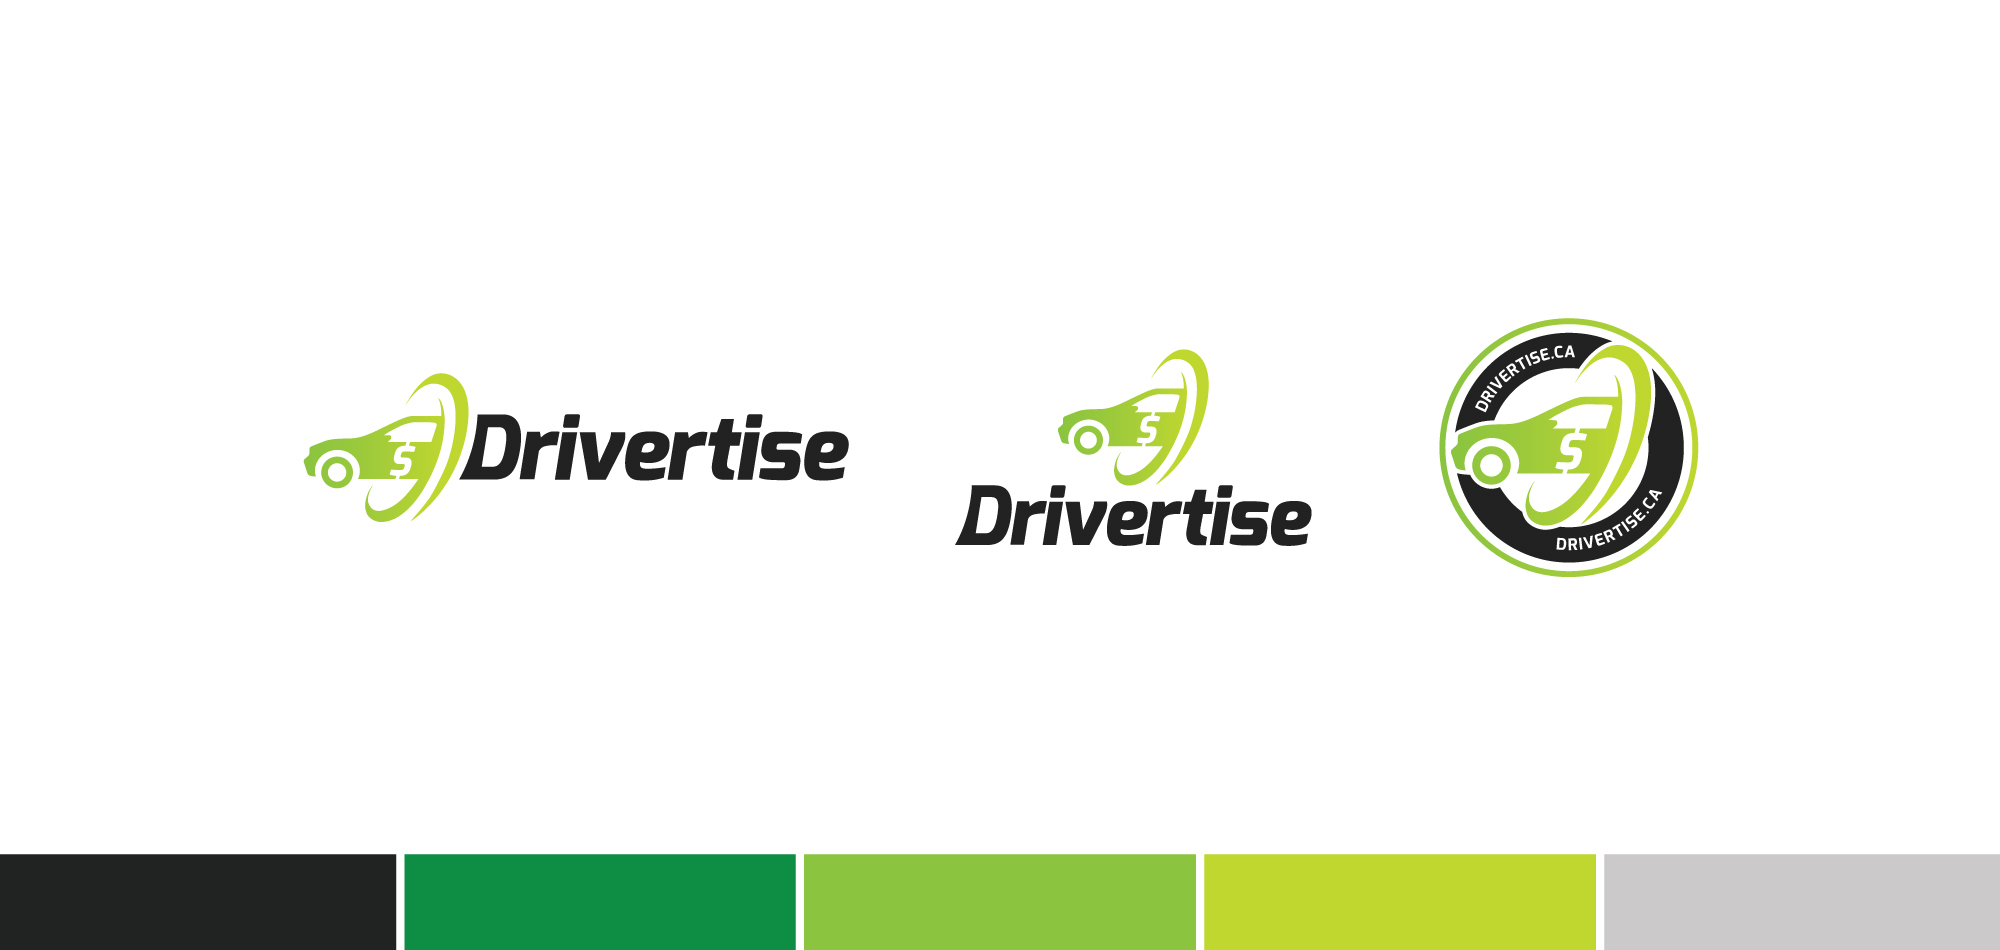 drivertise_logos_colours